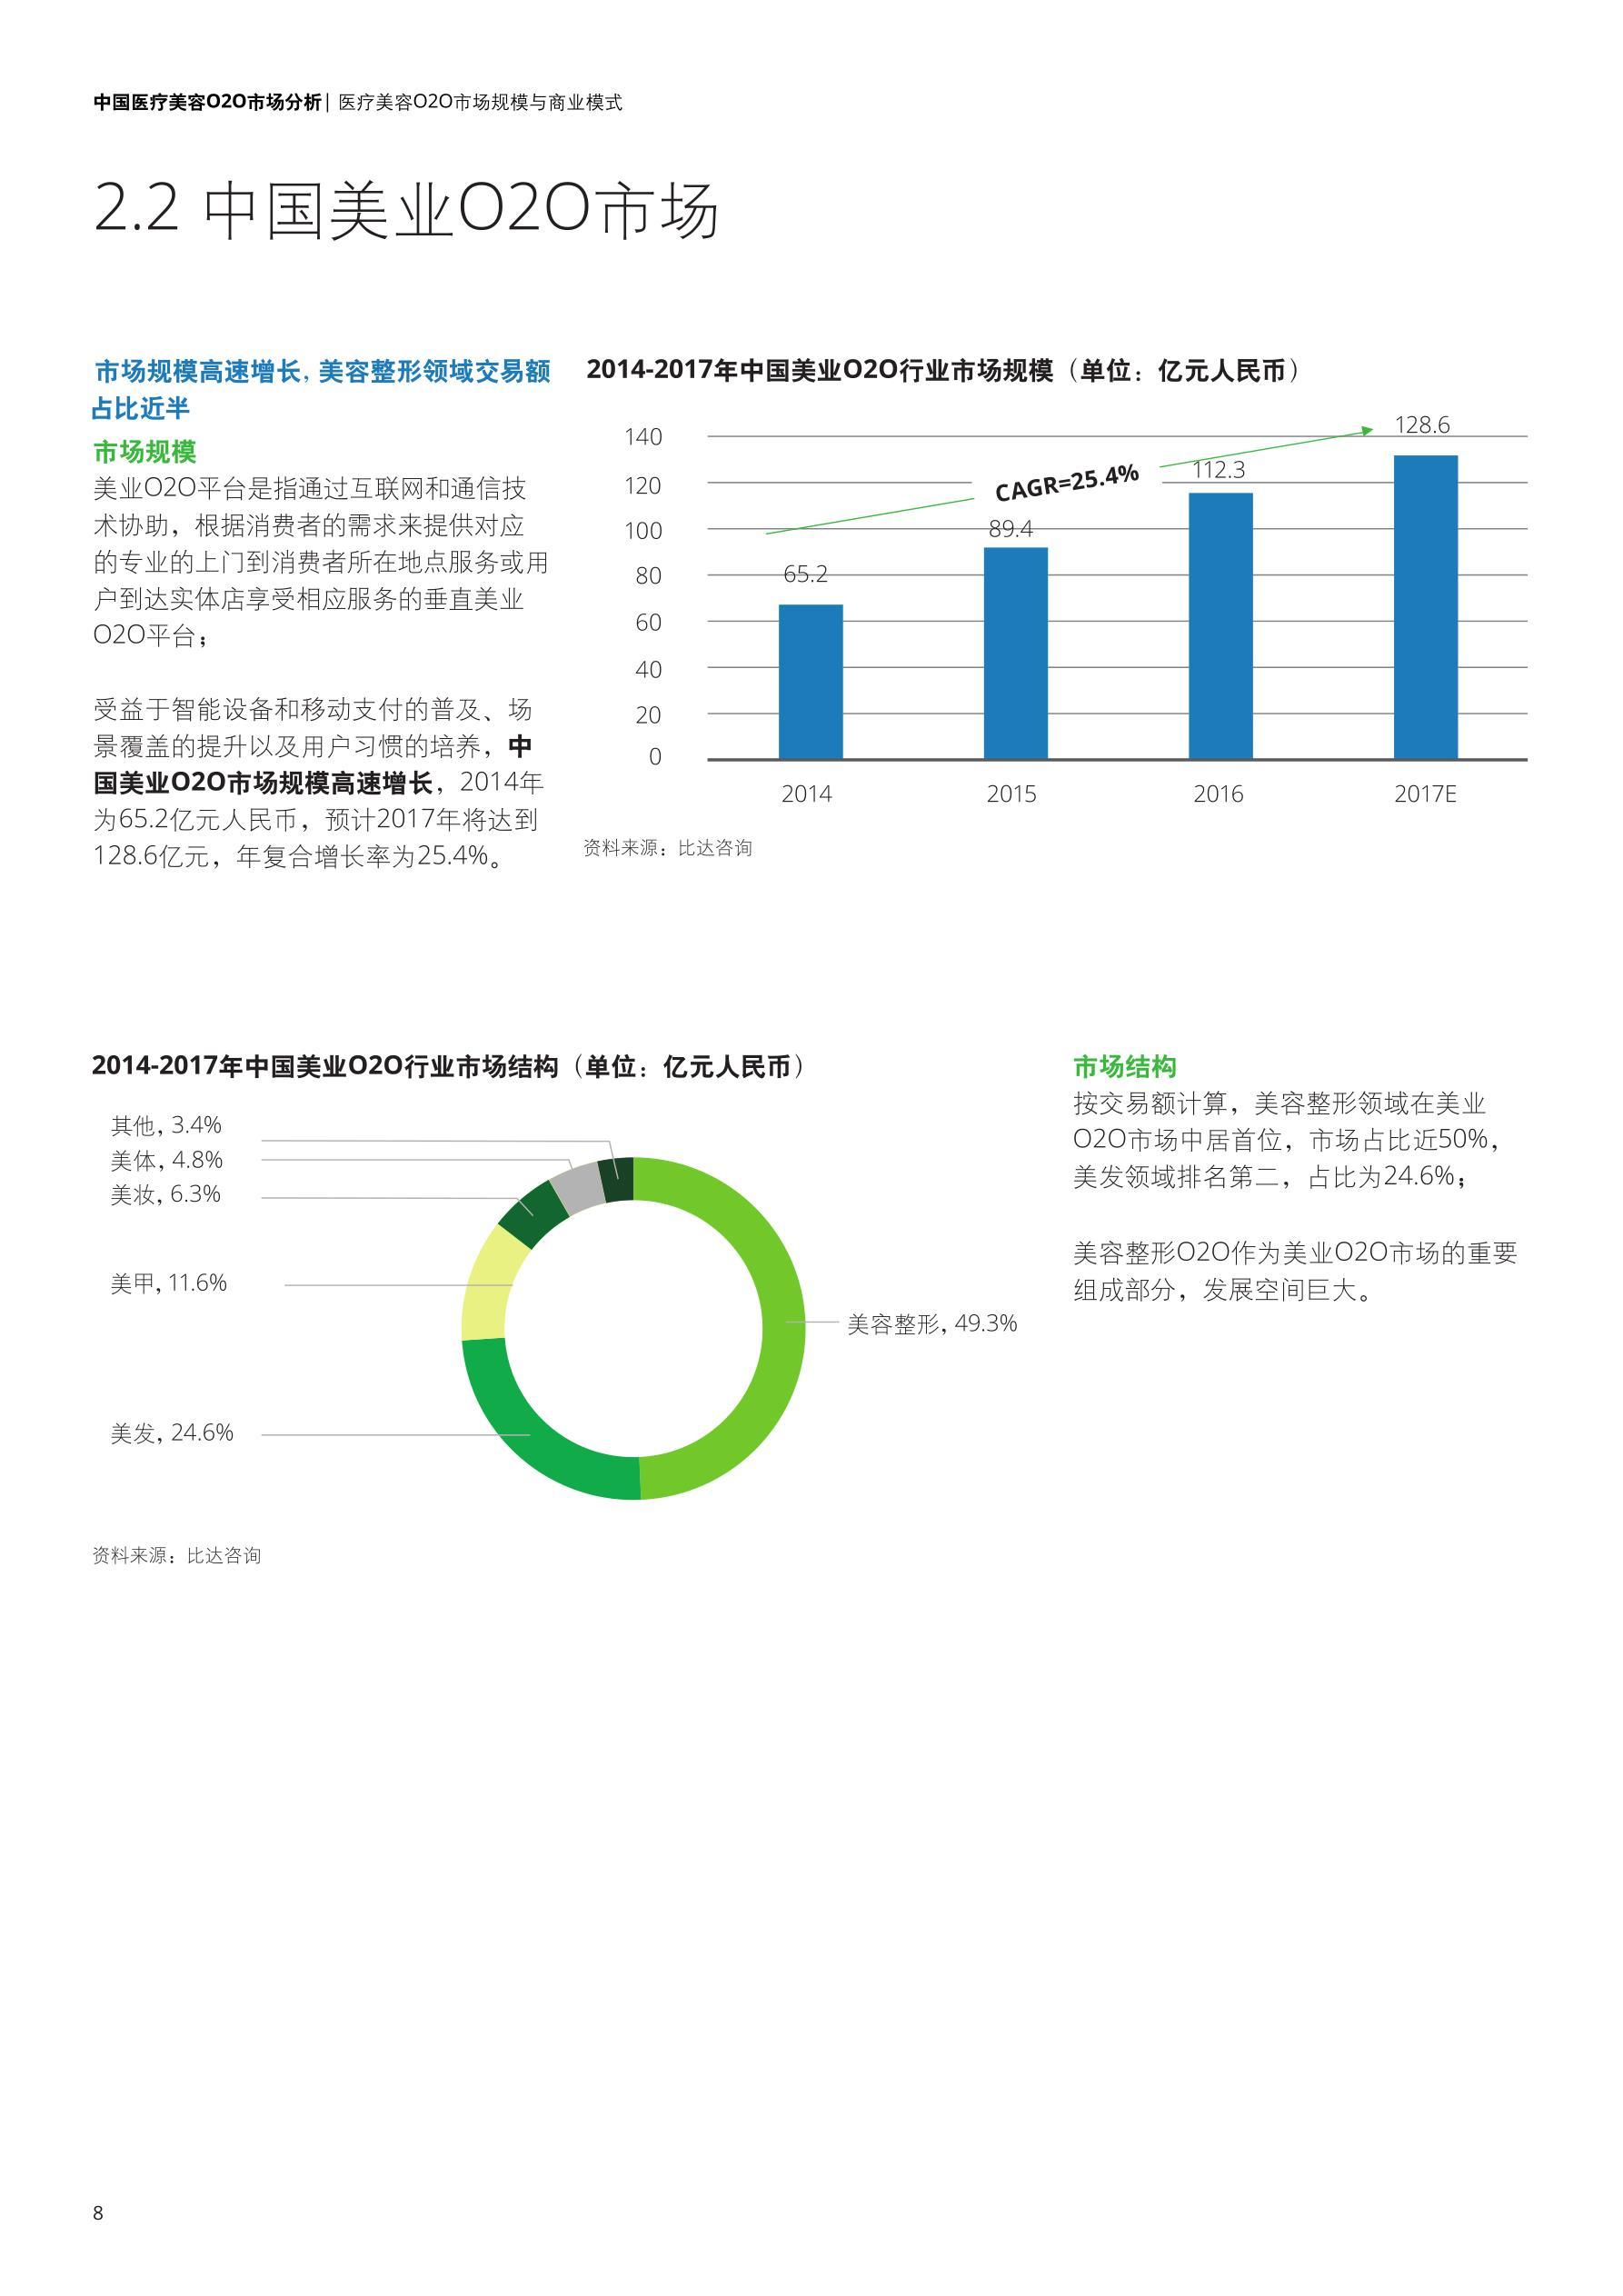 deloitte-cn-lshc-china-medical-cosmetology-o2o-market-analysis-zh-180914(1)_看图王_10